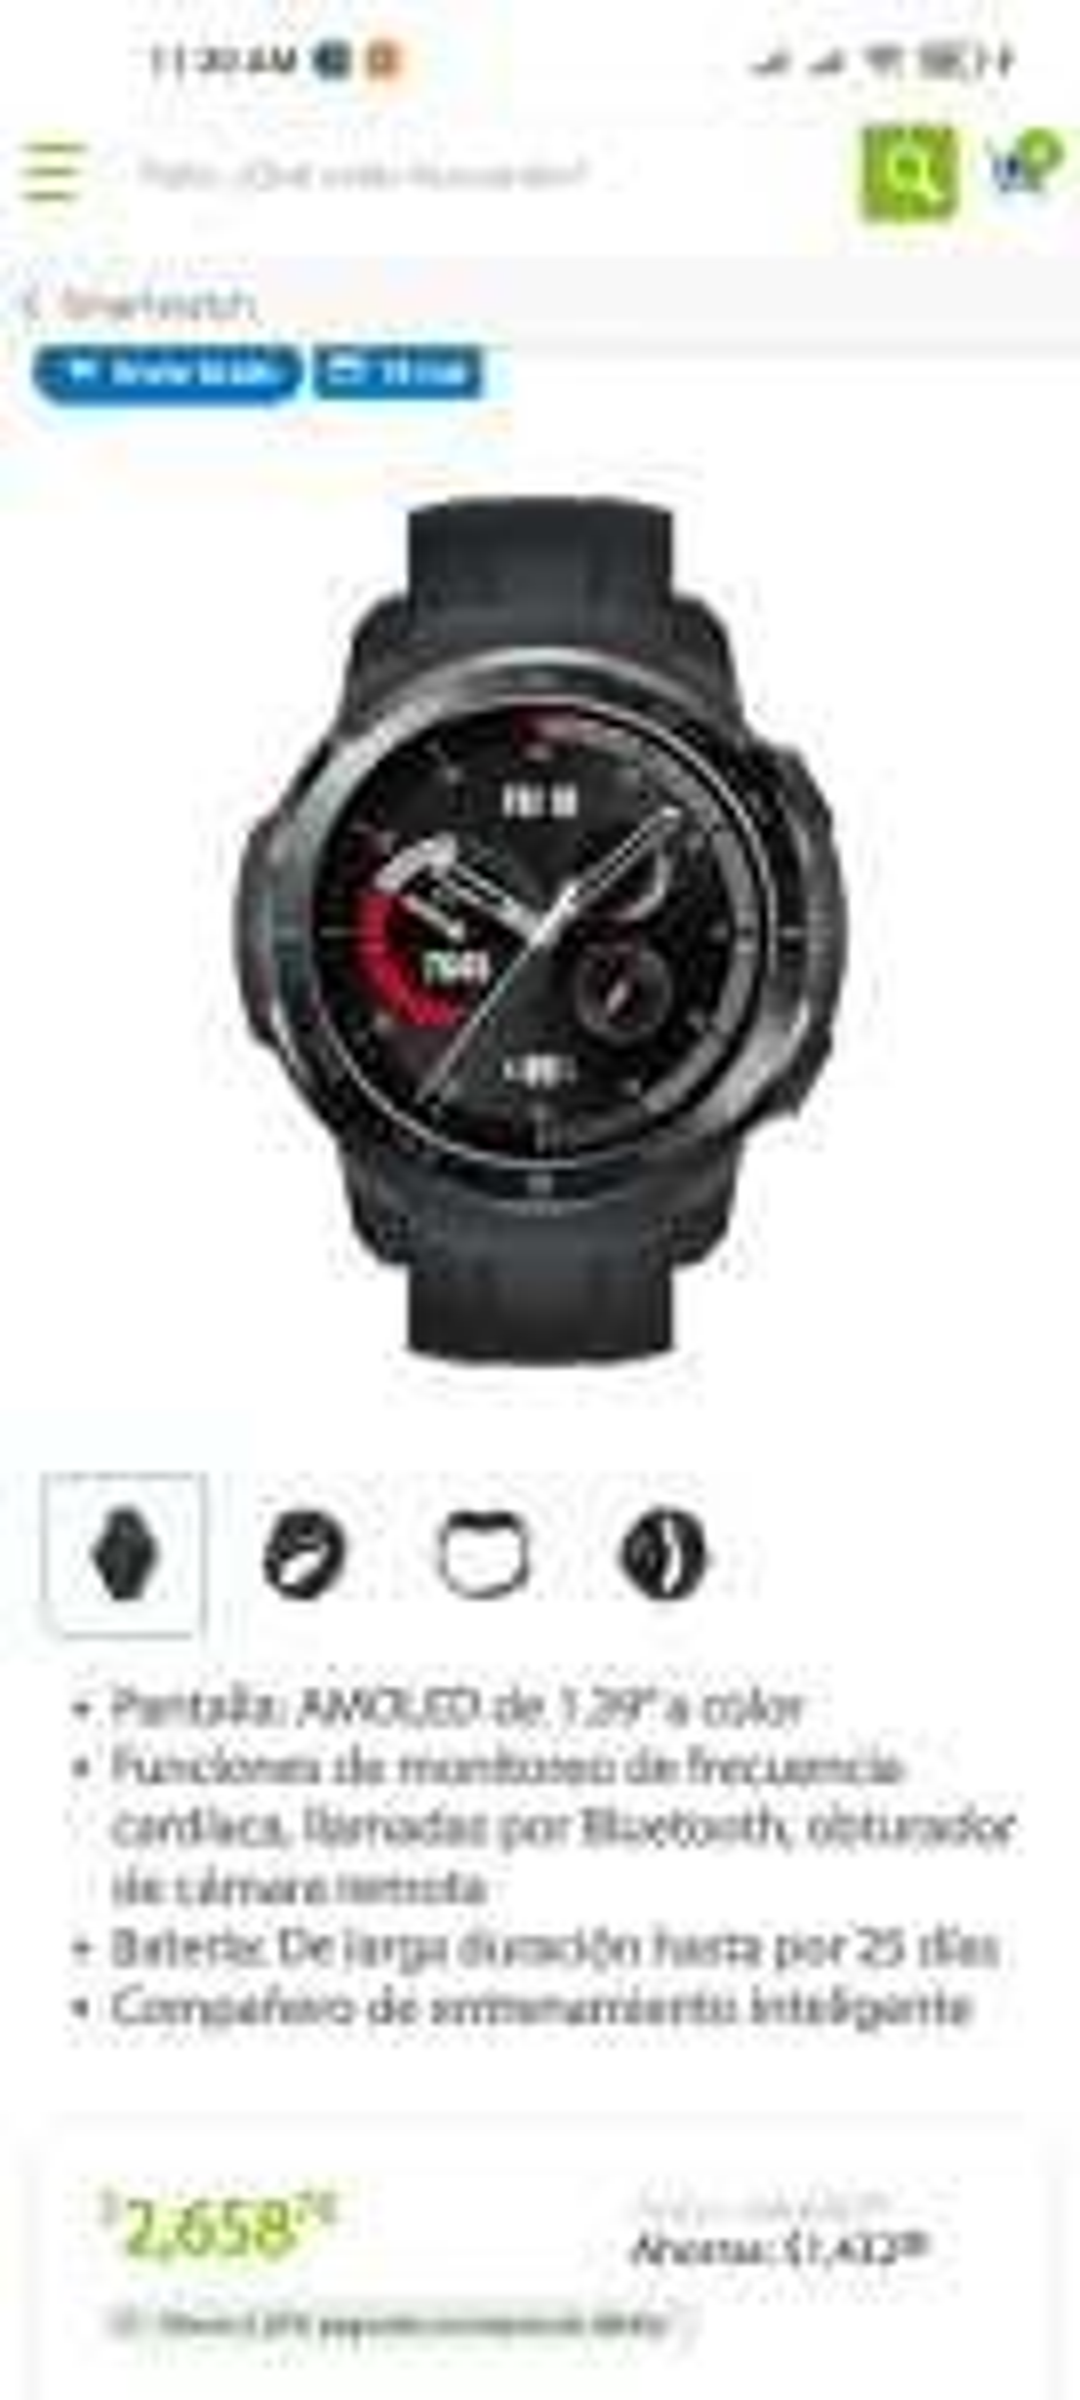 Sams club en línea - Smartwatch honor gs pro